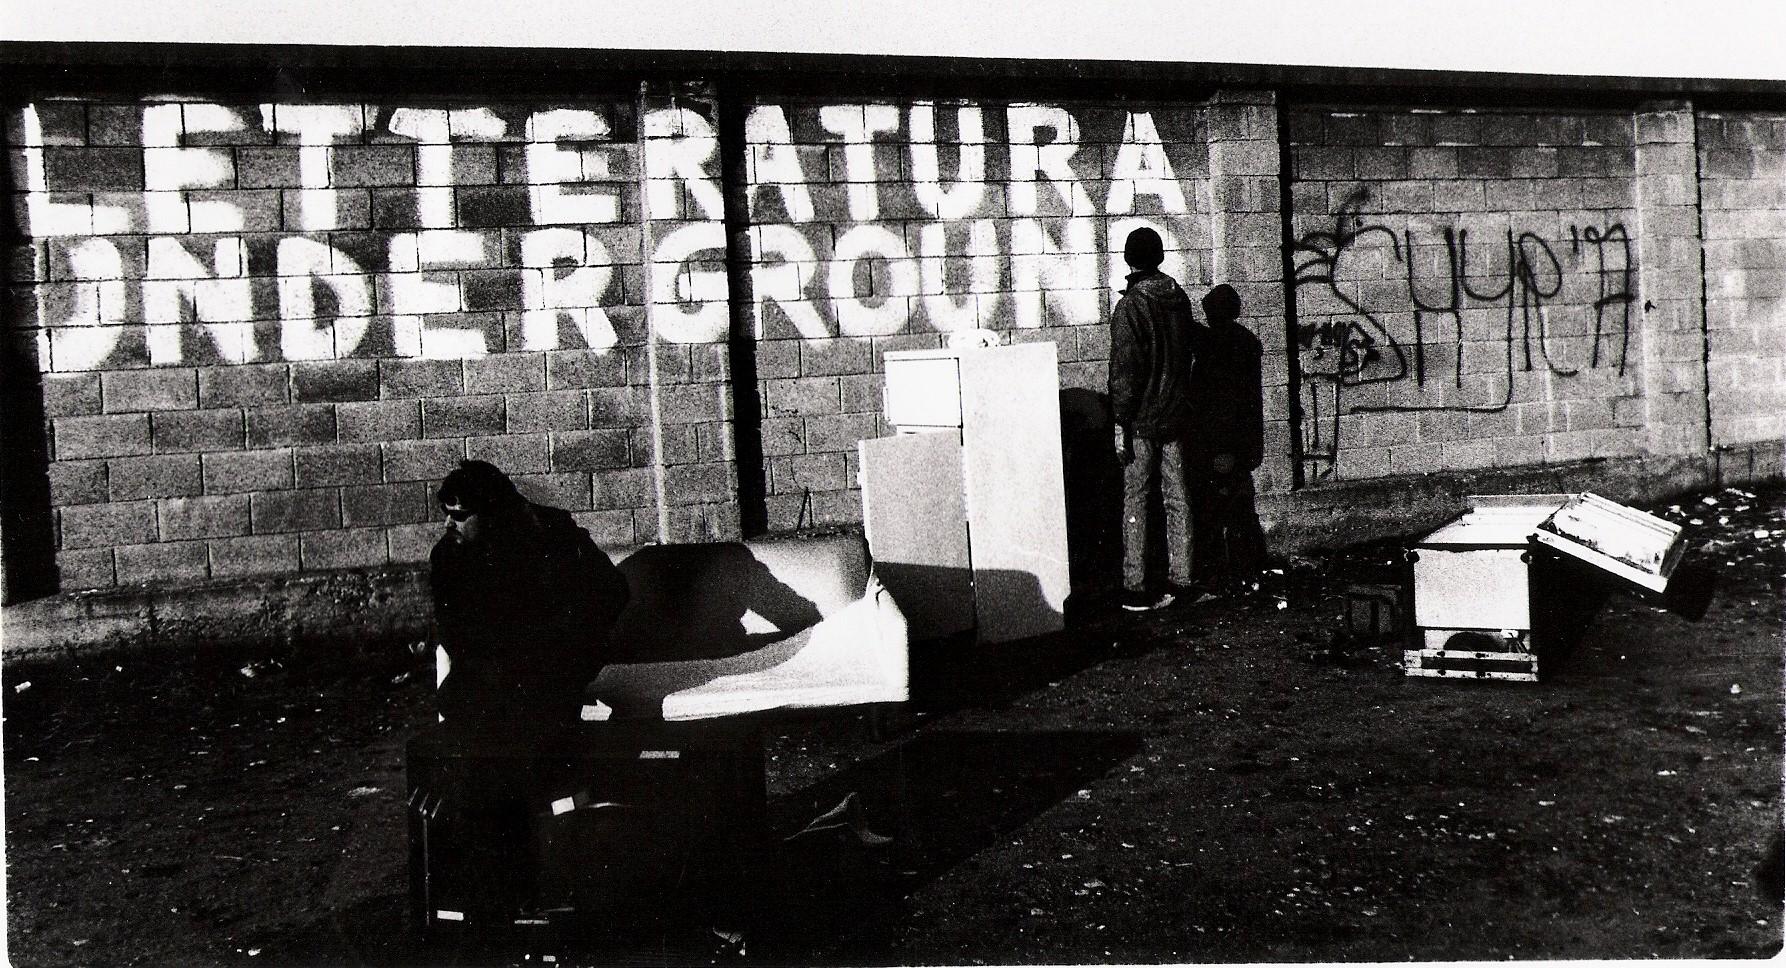 Letteratura Underground